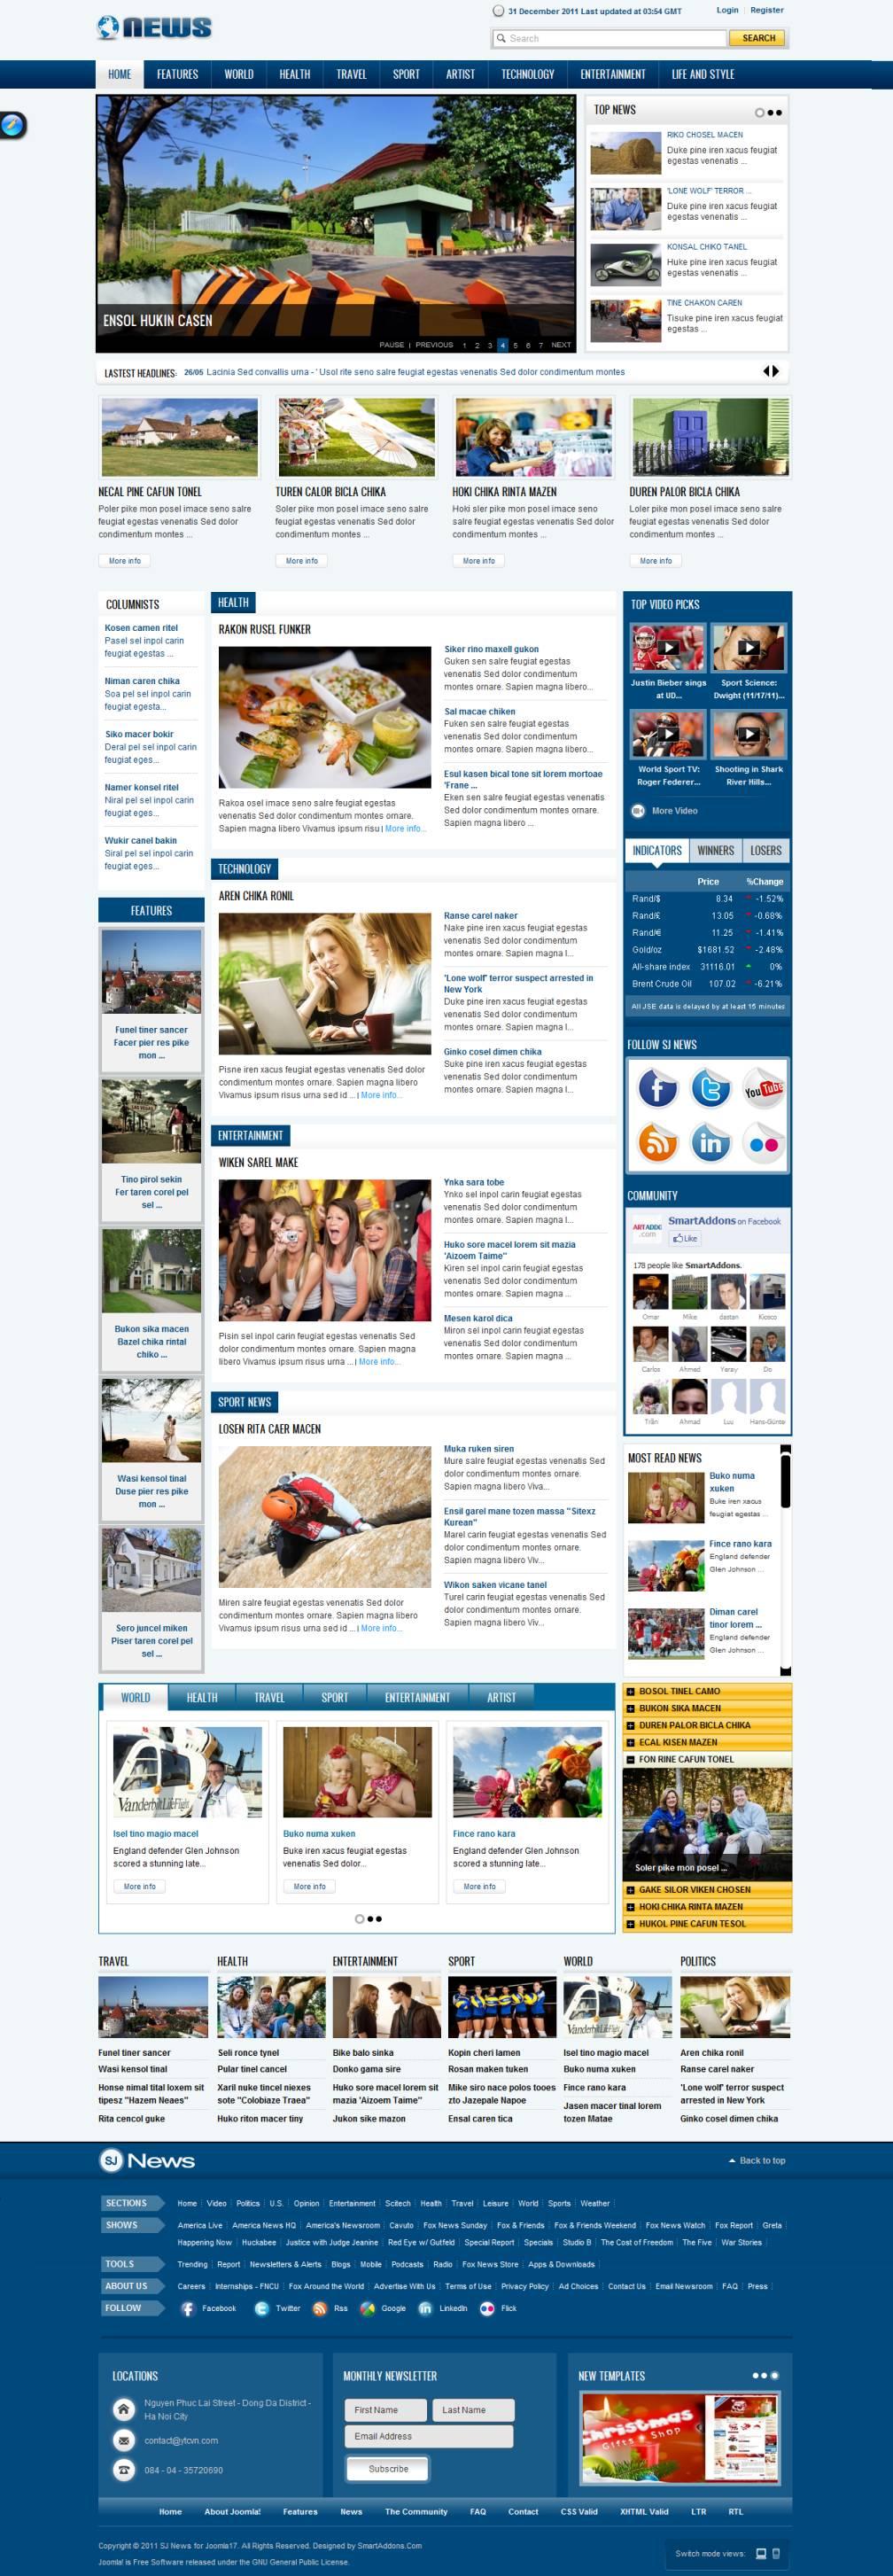 Joomla Responsive Templates Free Download 3.4